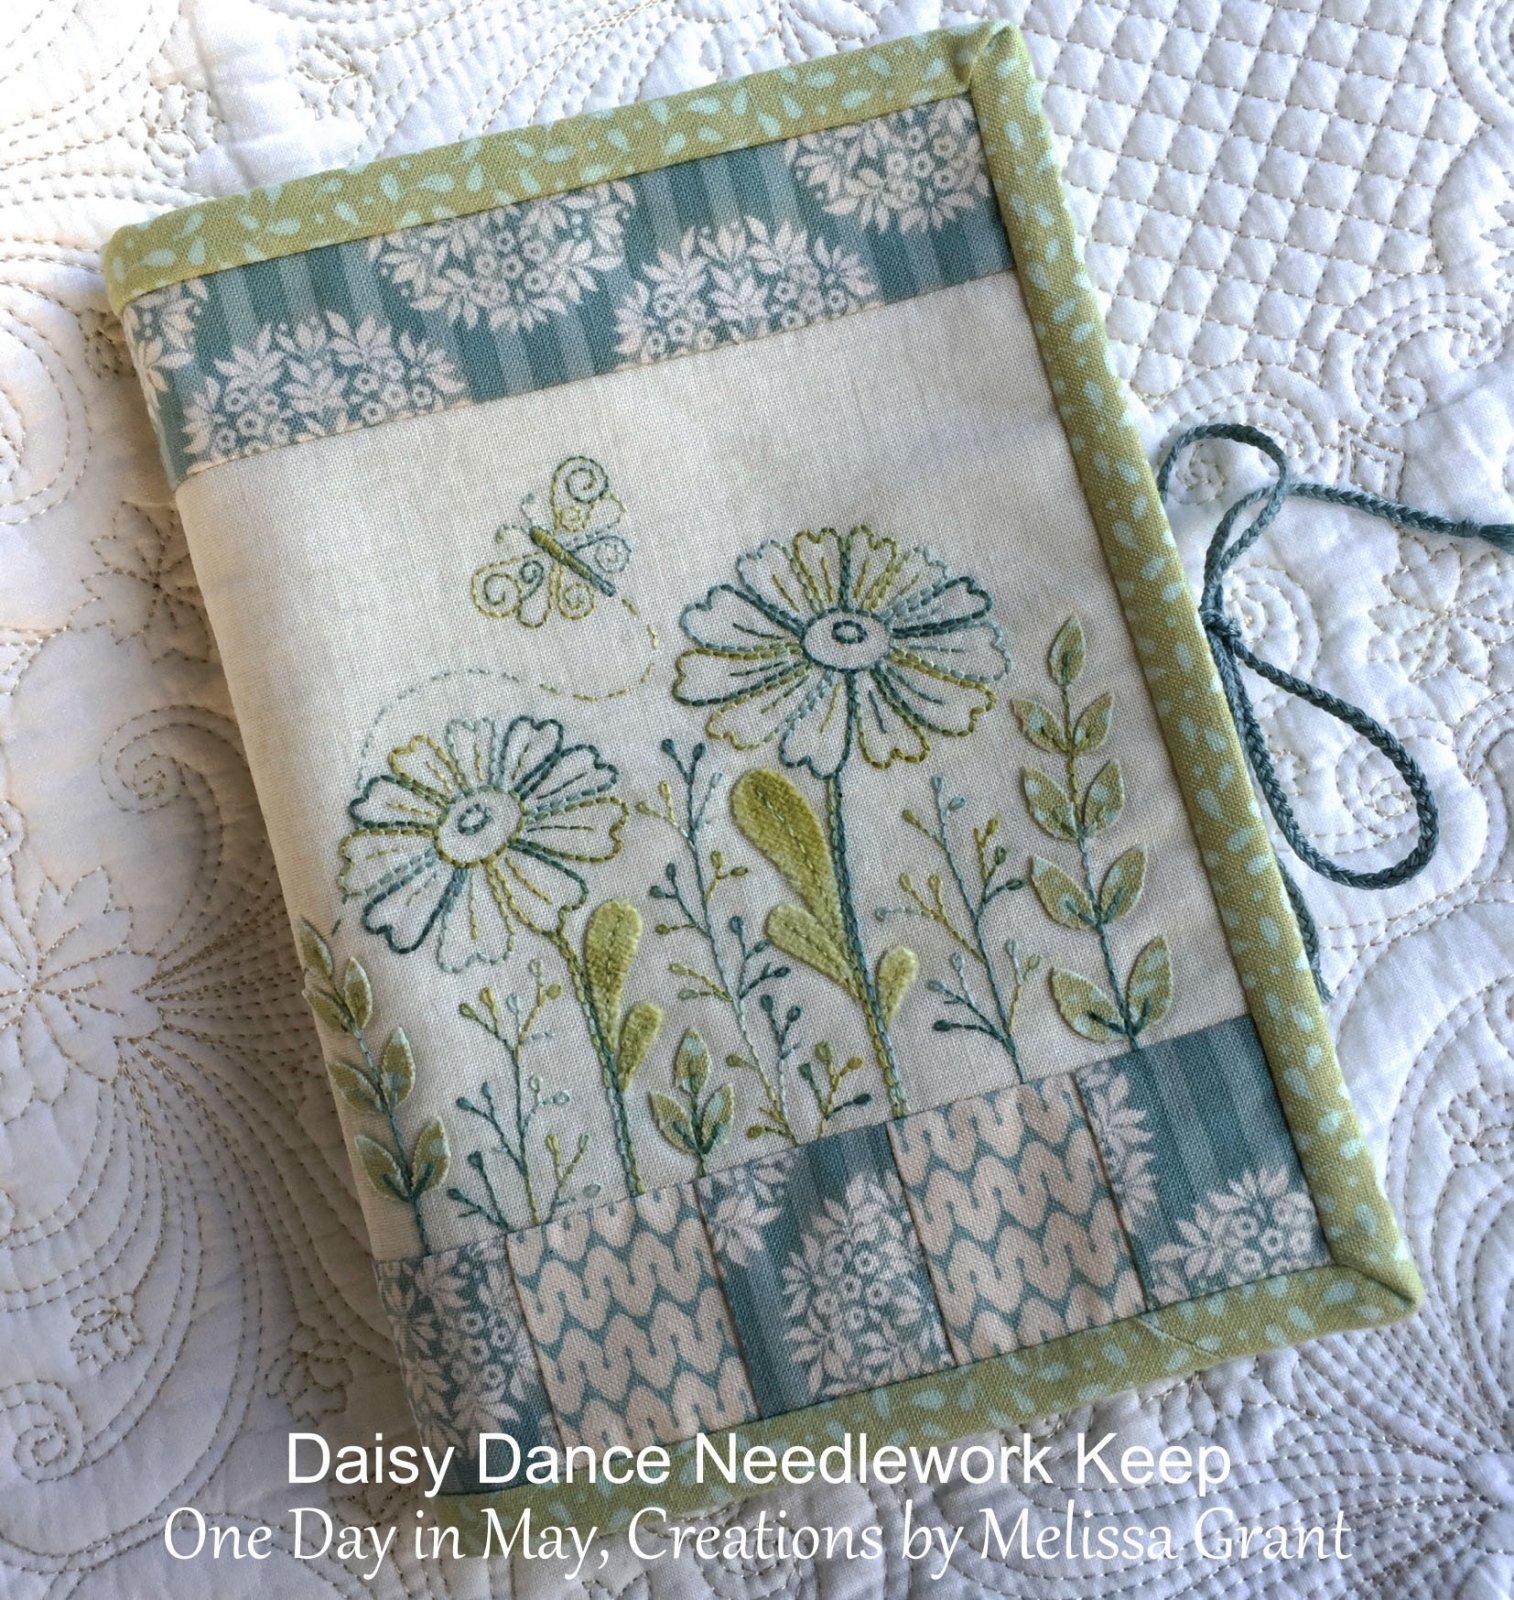 Daisy Dance Needlework Keep Pattern